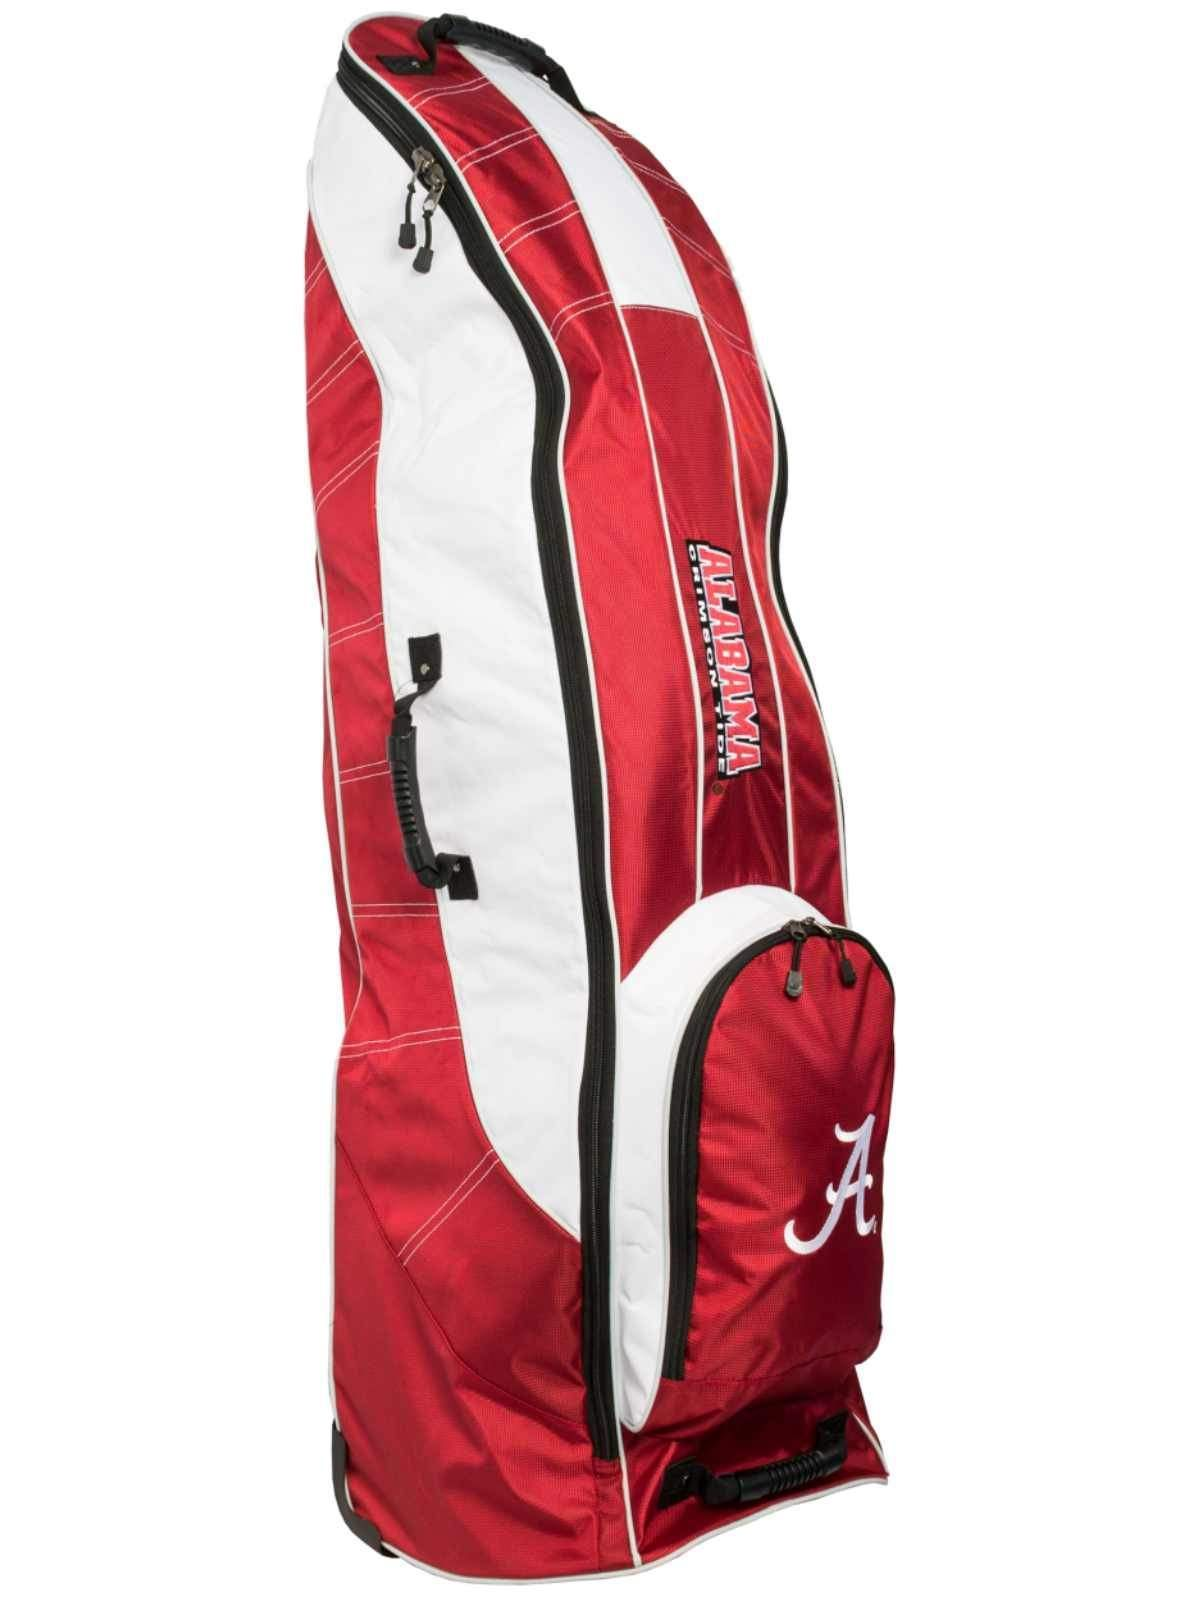 Alabama Crimson Tide Team Golf Red Golf Clubs Wheeled